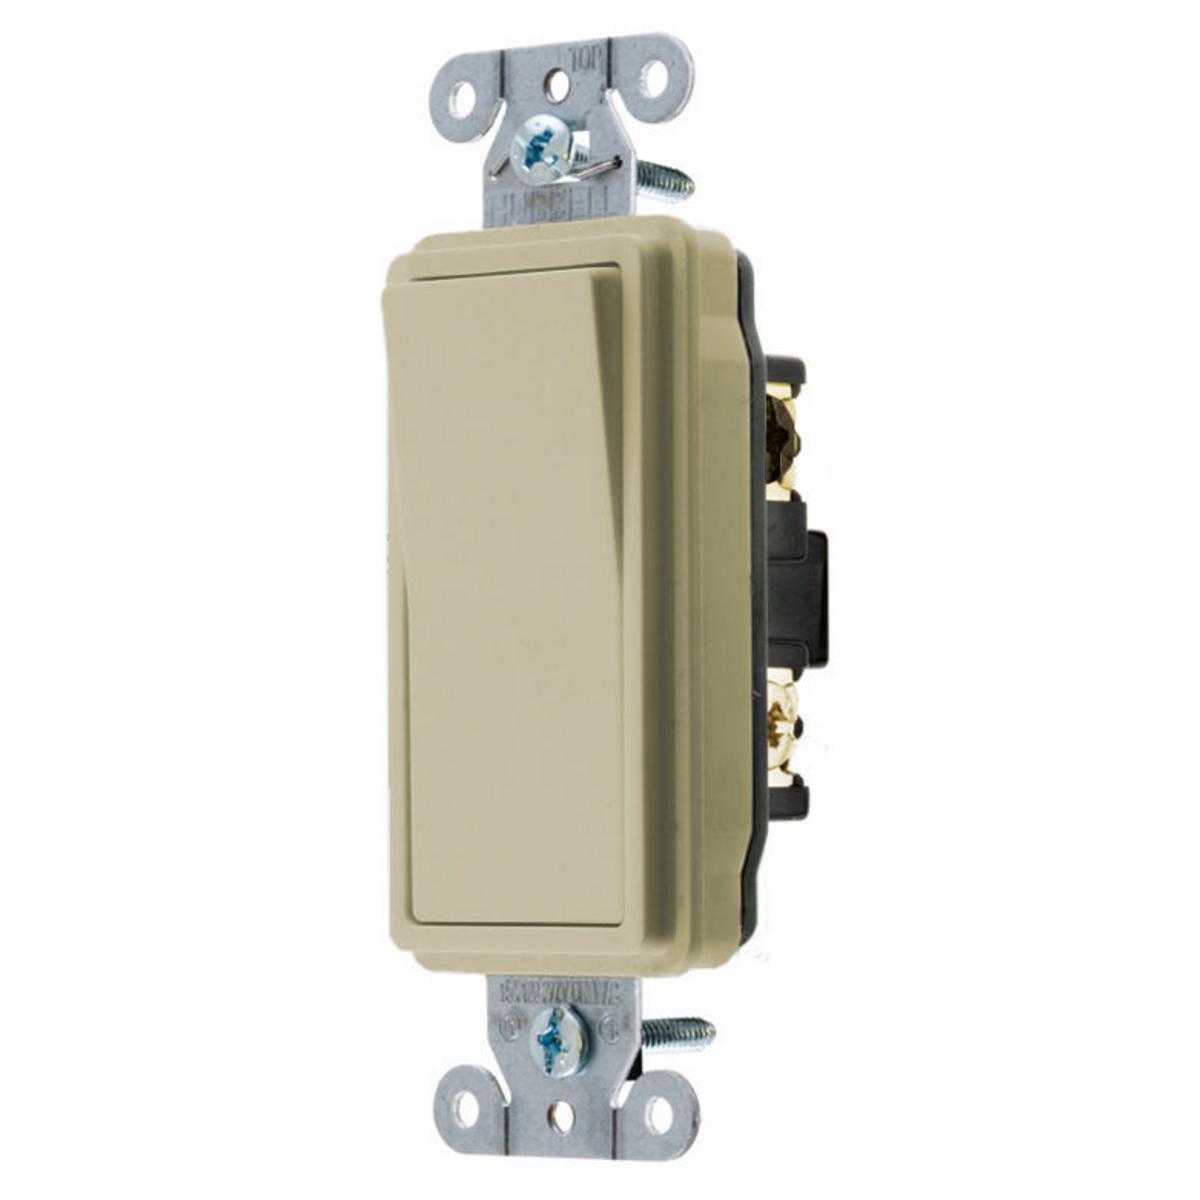 Hubbell DS315I 15 Amp 120/277 VAC 3-Way Ivory Rocker Switch